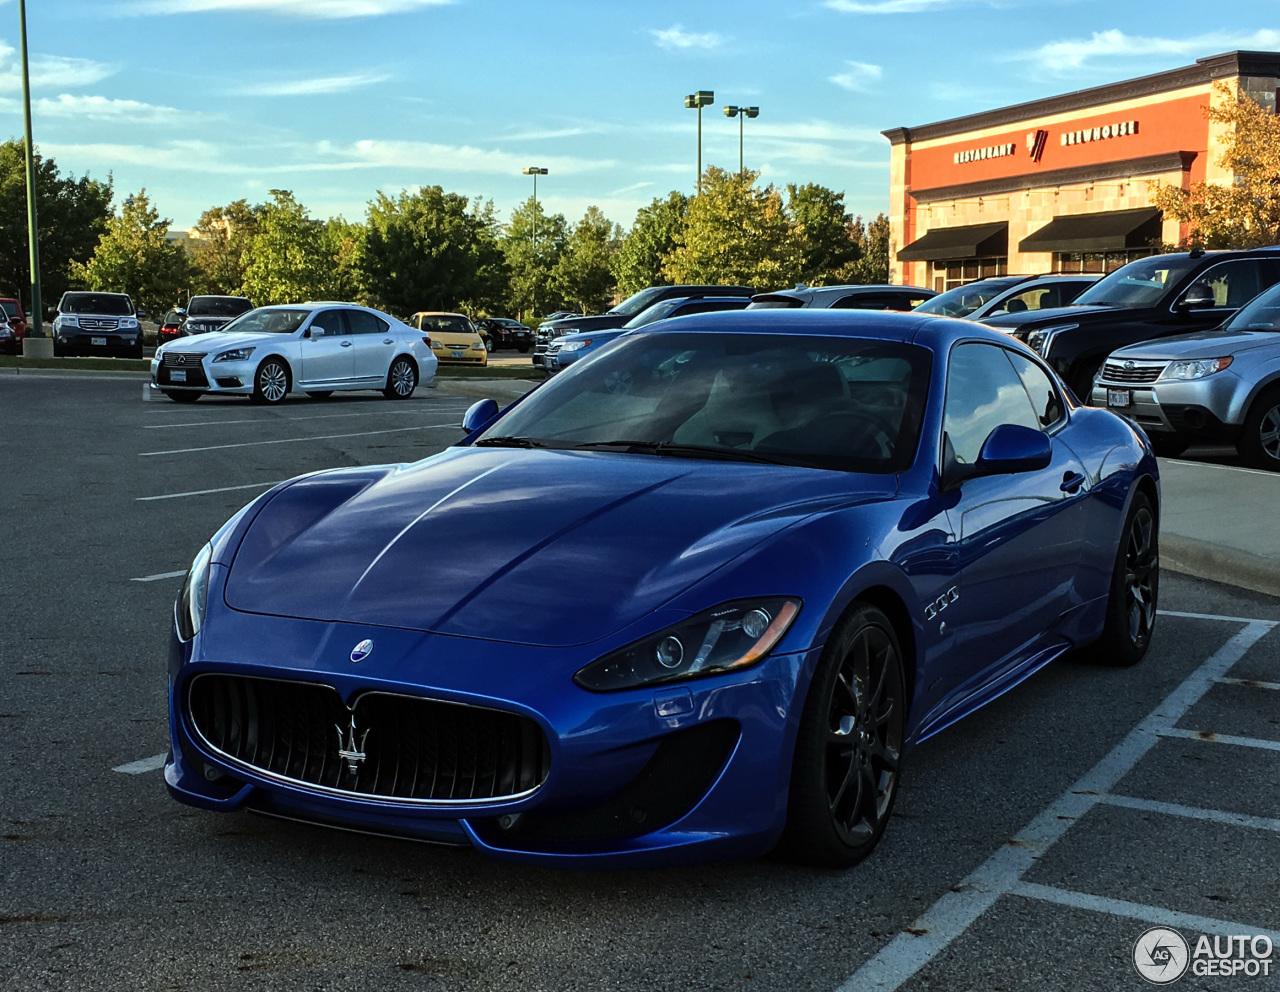 Maserati Granturismo Sport 26 September 2016 Autogespot